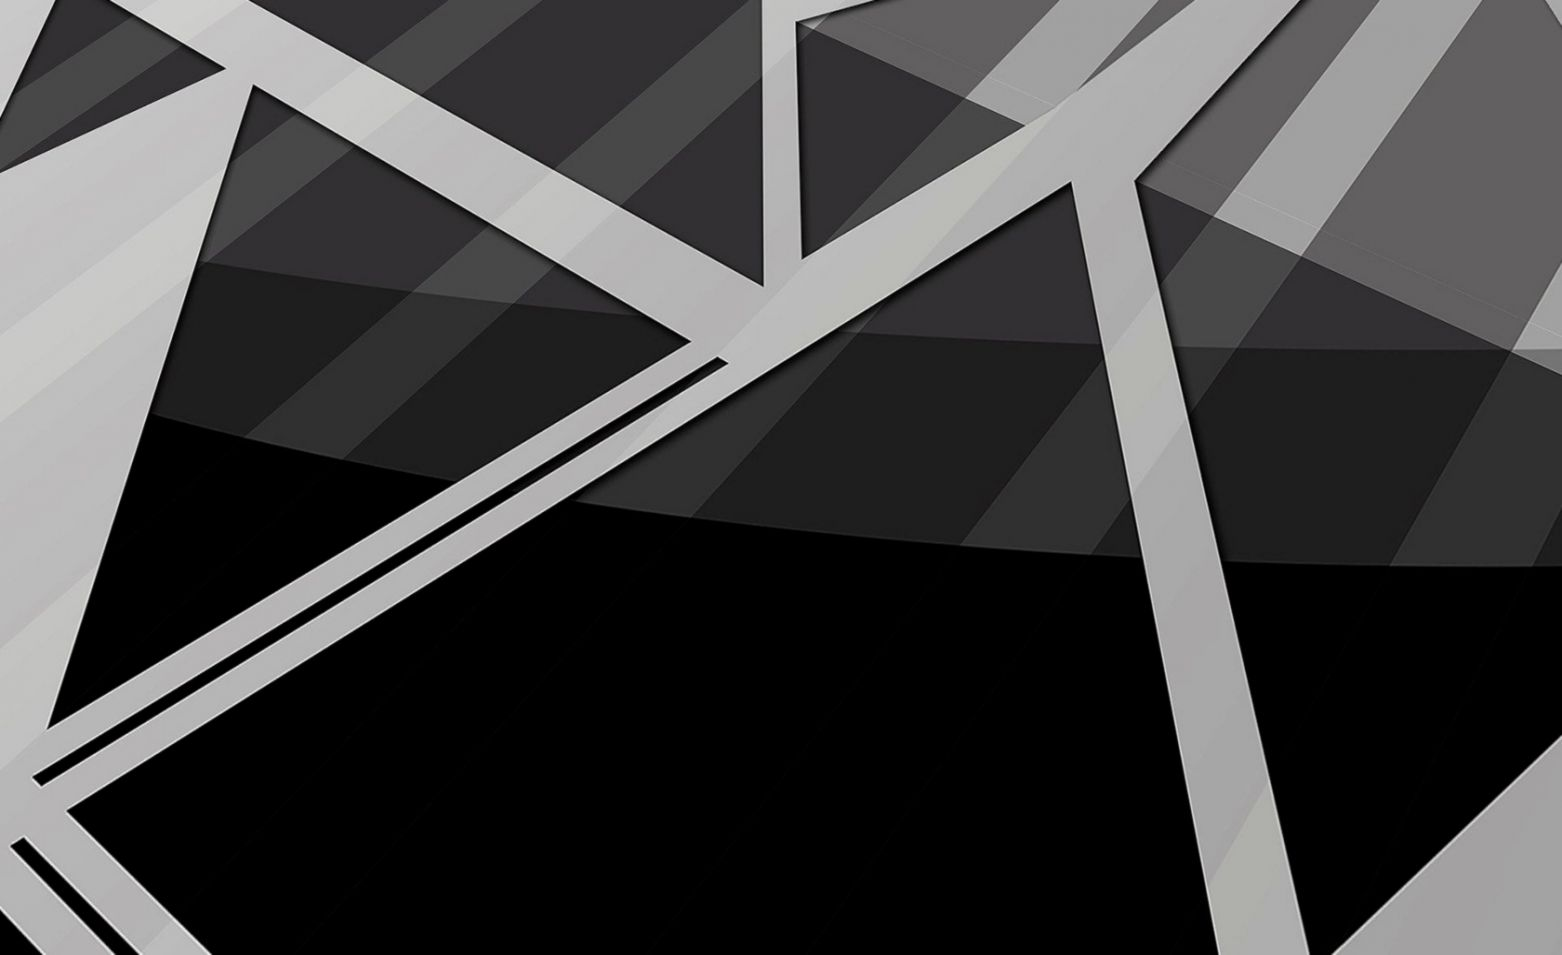 Abstract Black White Line Creative Background Wallpaper Black And White Abstract Background 1562x955 Wallpaper Teahub Io